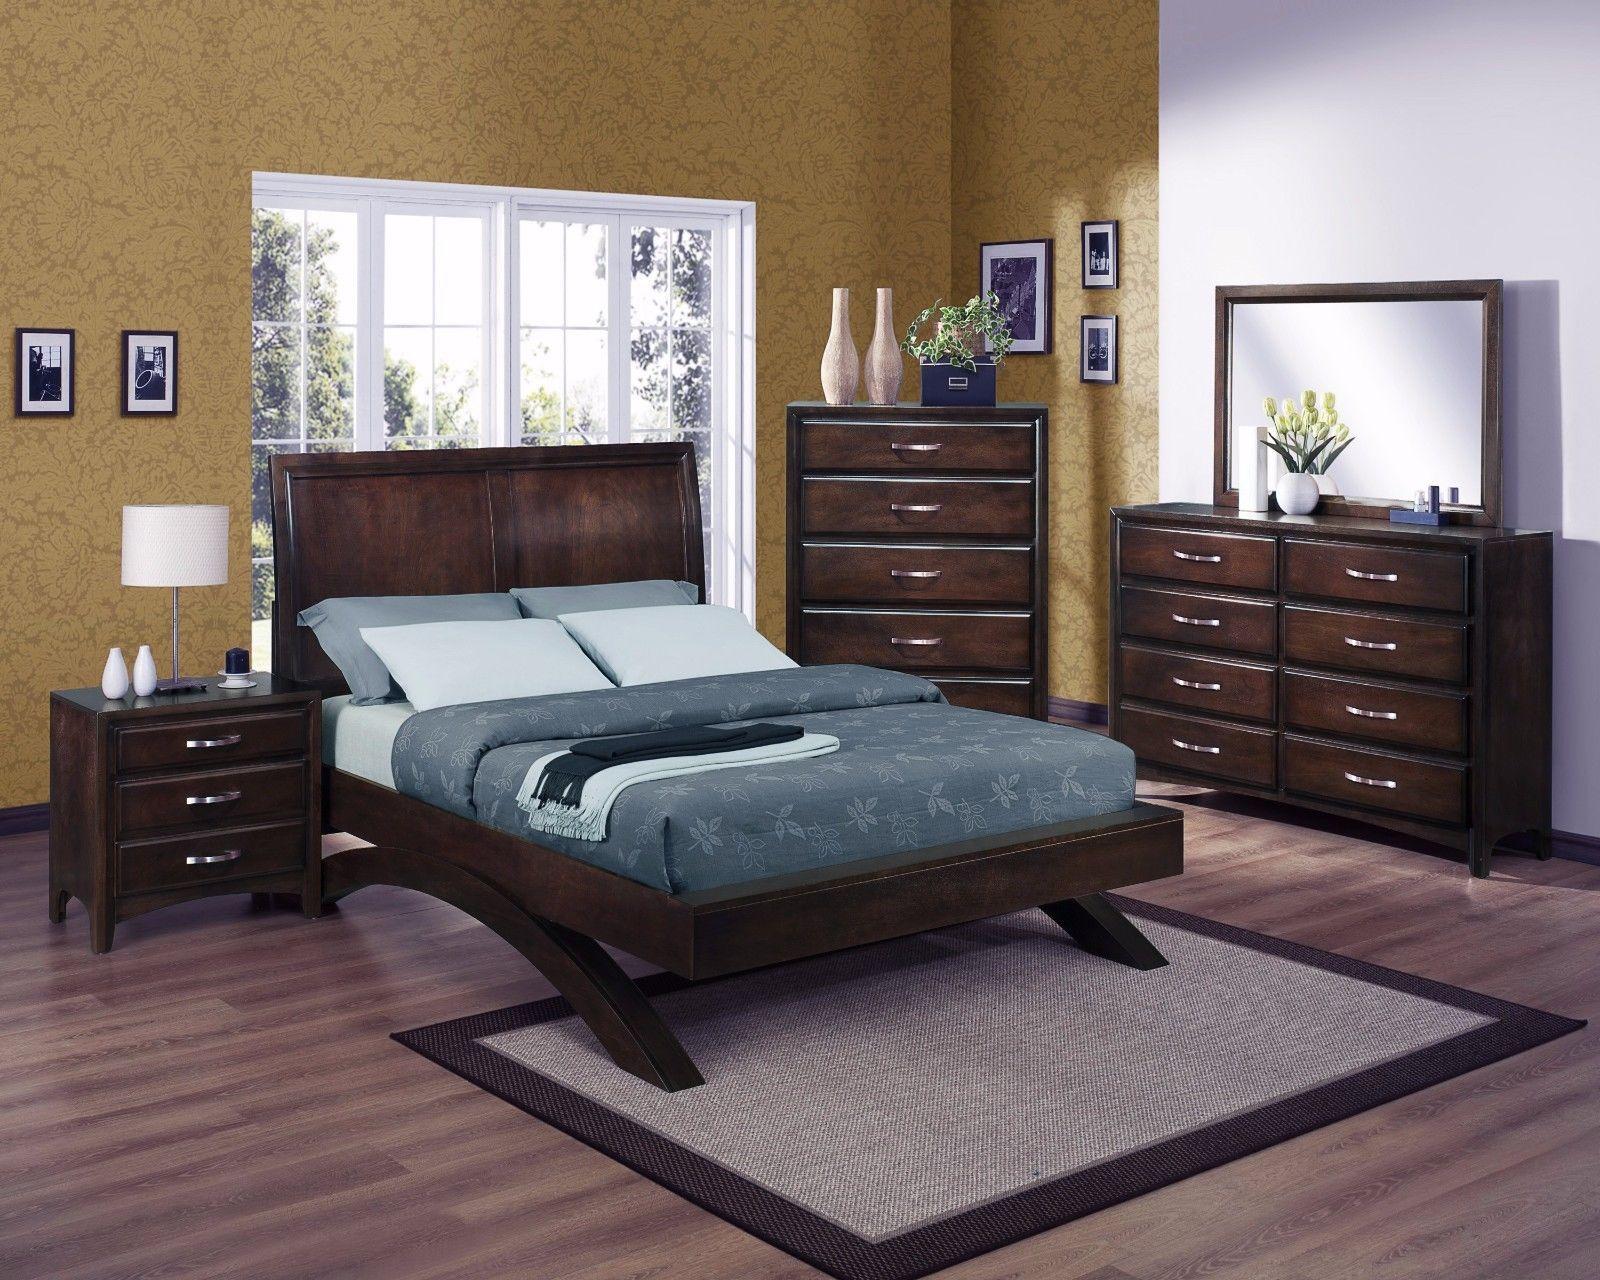 Crown Mark RB6150 Vera King Bedroom Set Modern Transitional  2 Night Stands